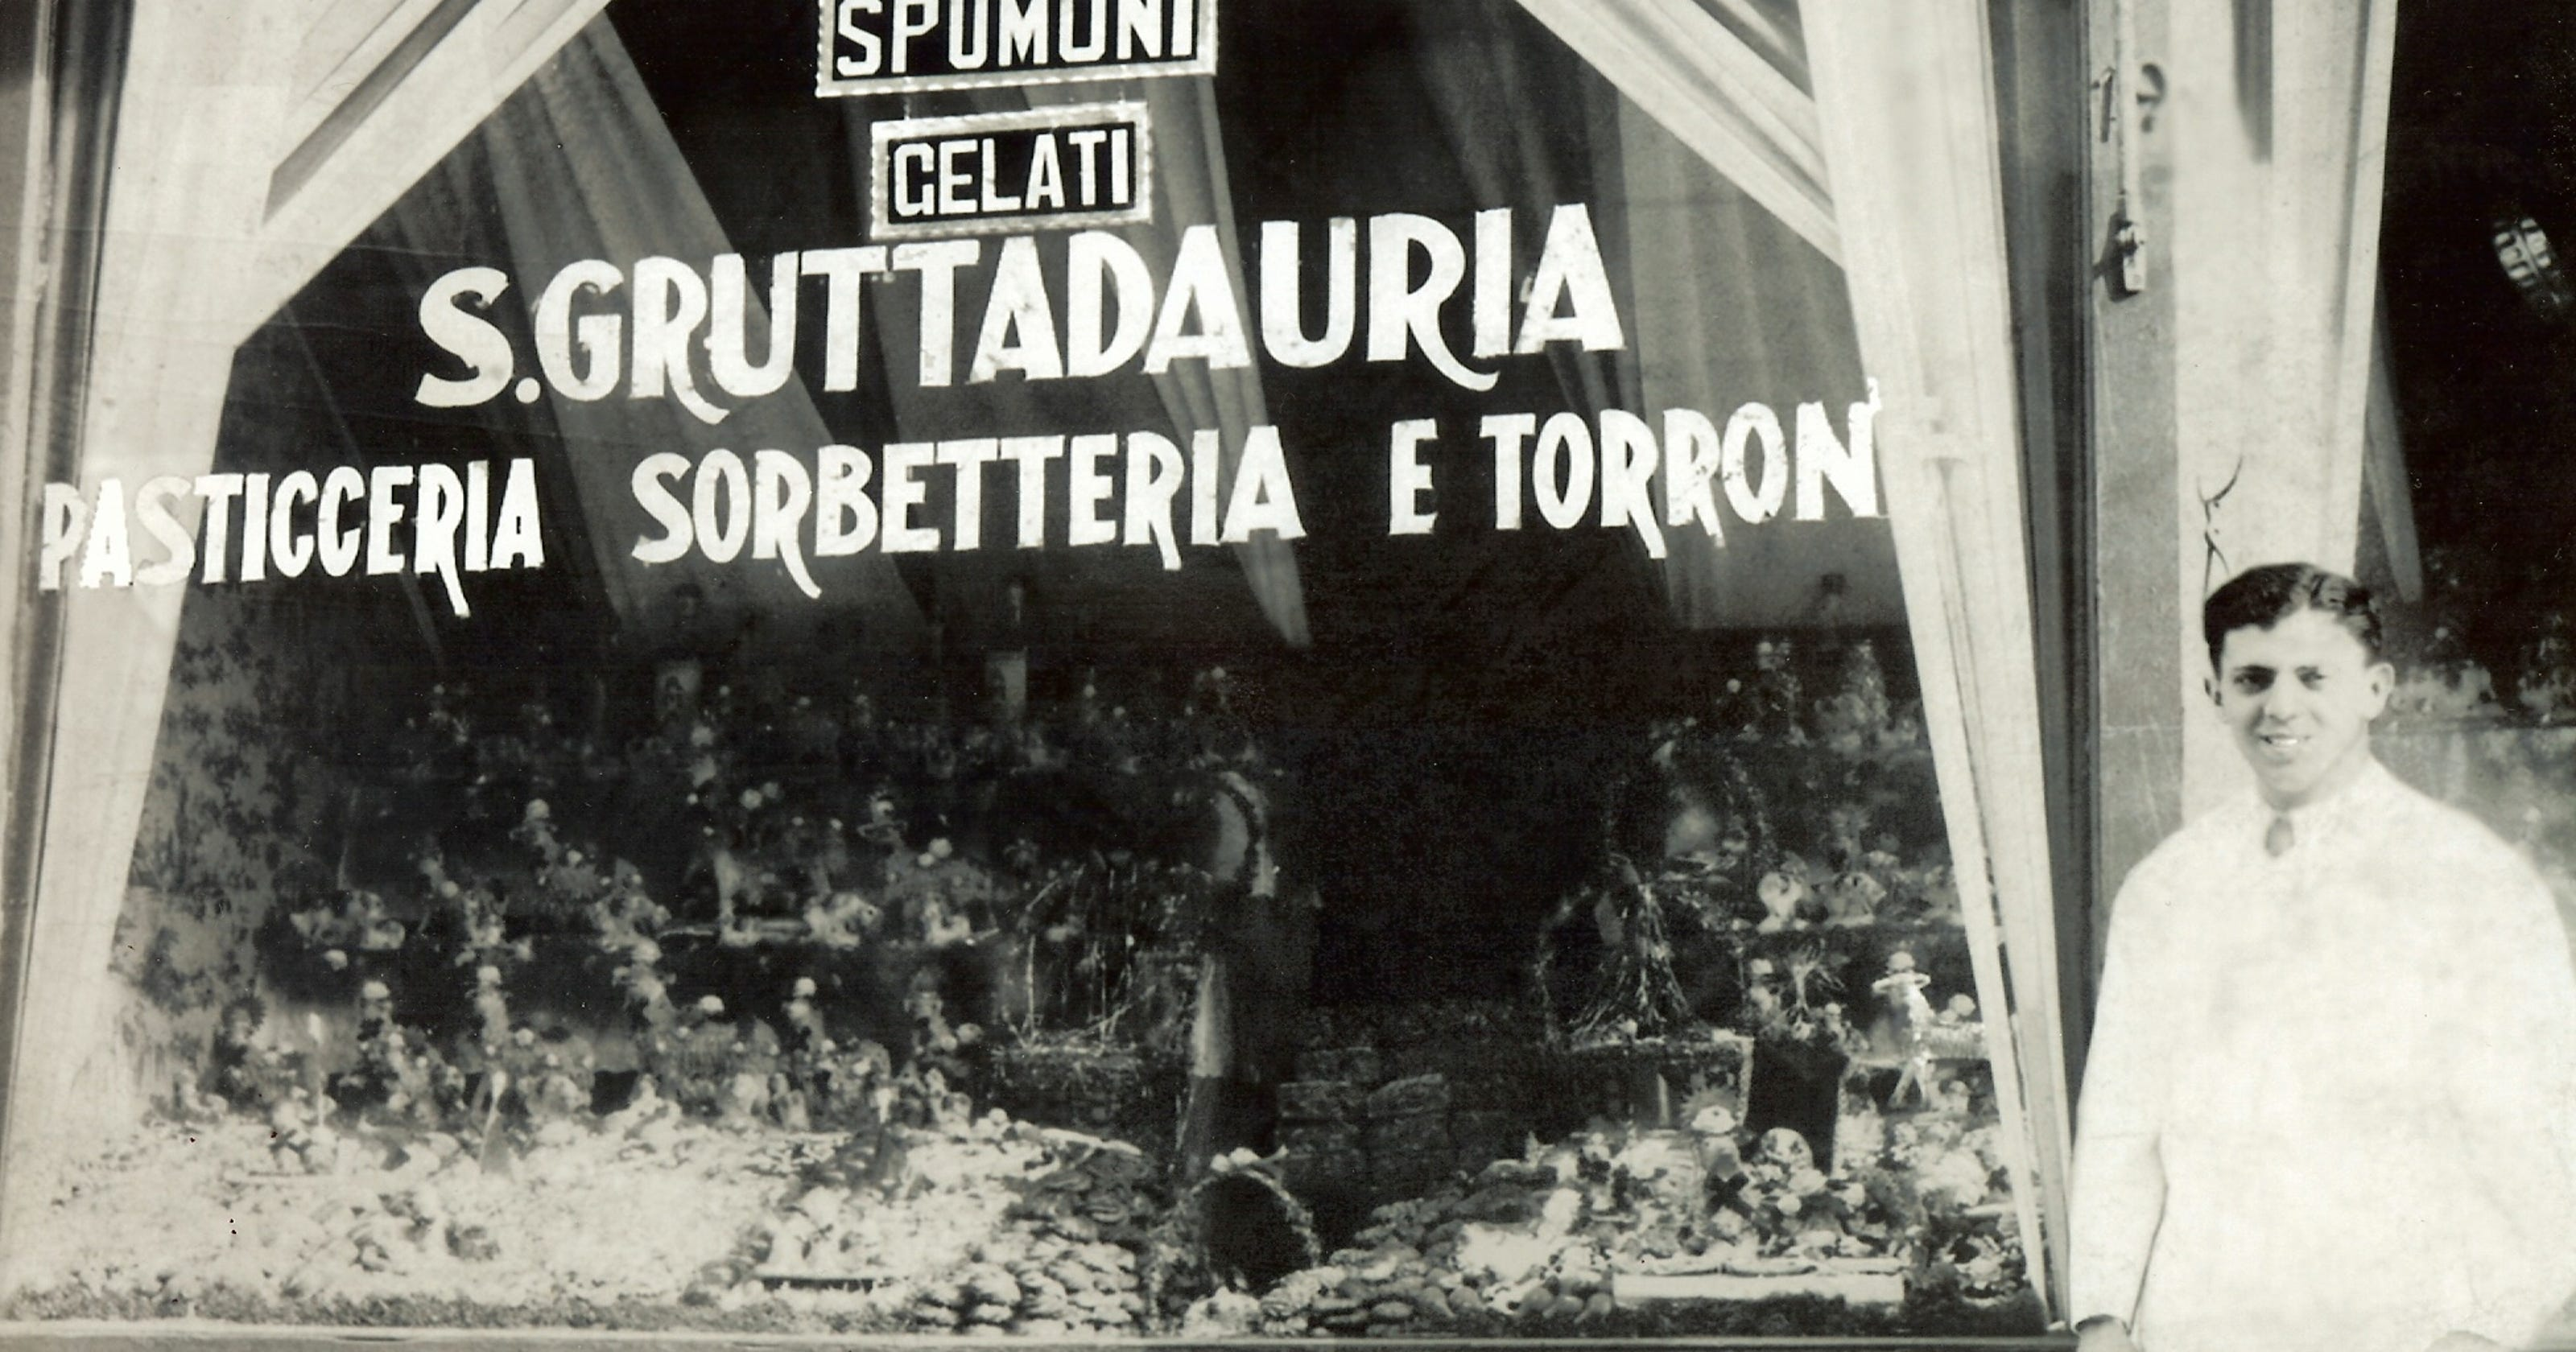 Gruttadauria Bakery has 100 years of history here